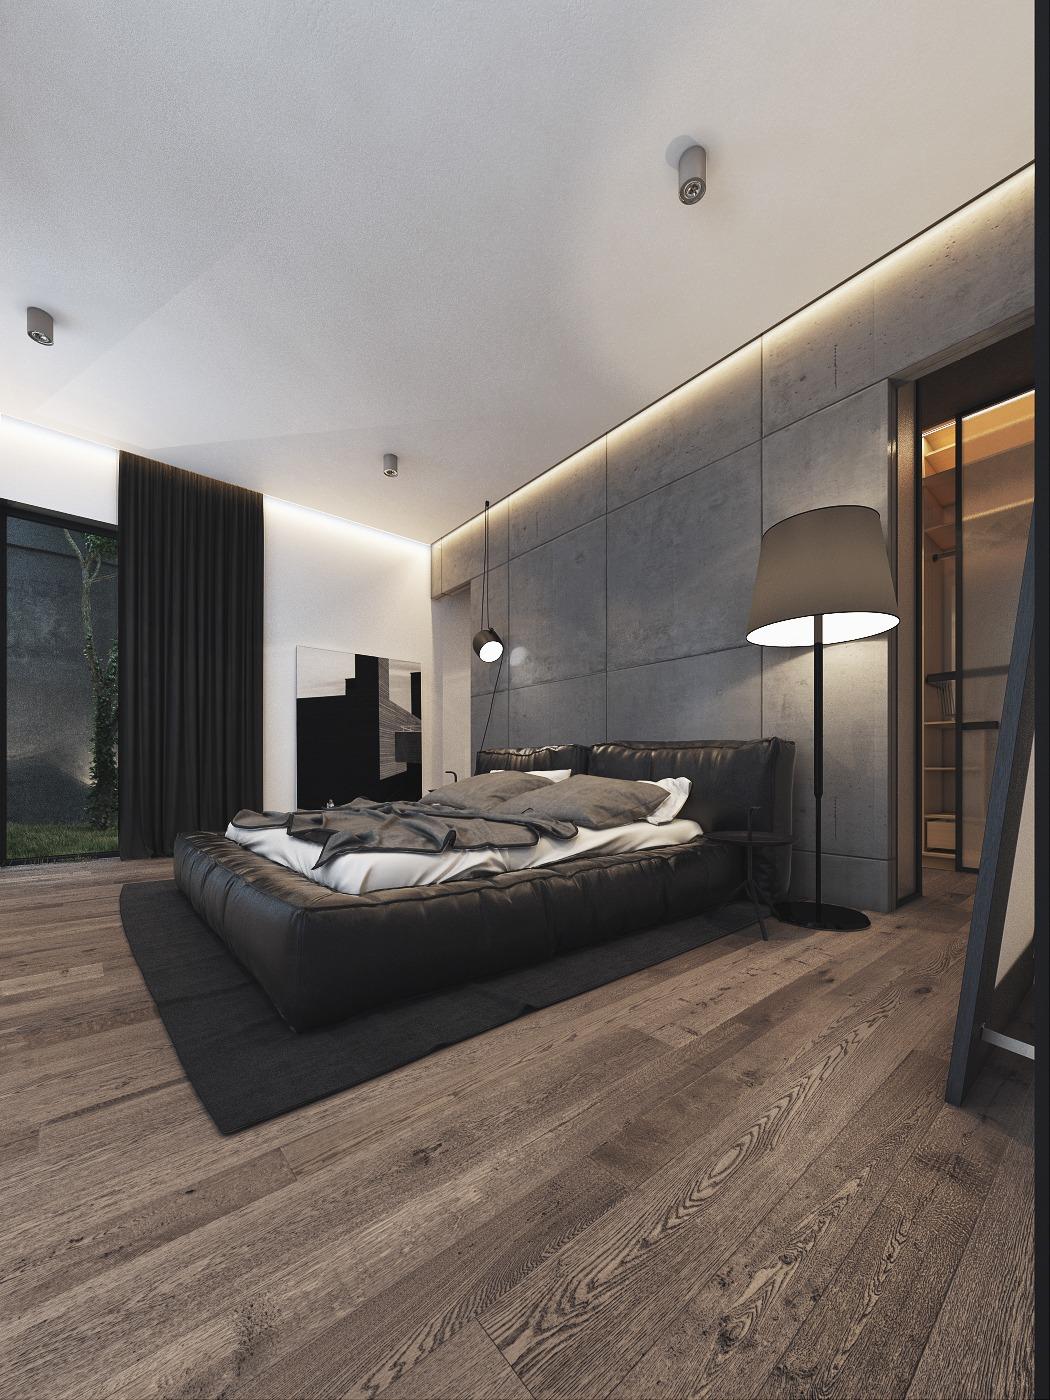 20 black bedroom design ideas to copy  decoration love